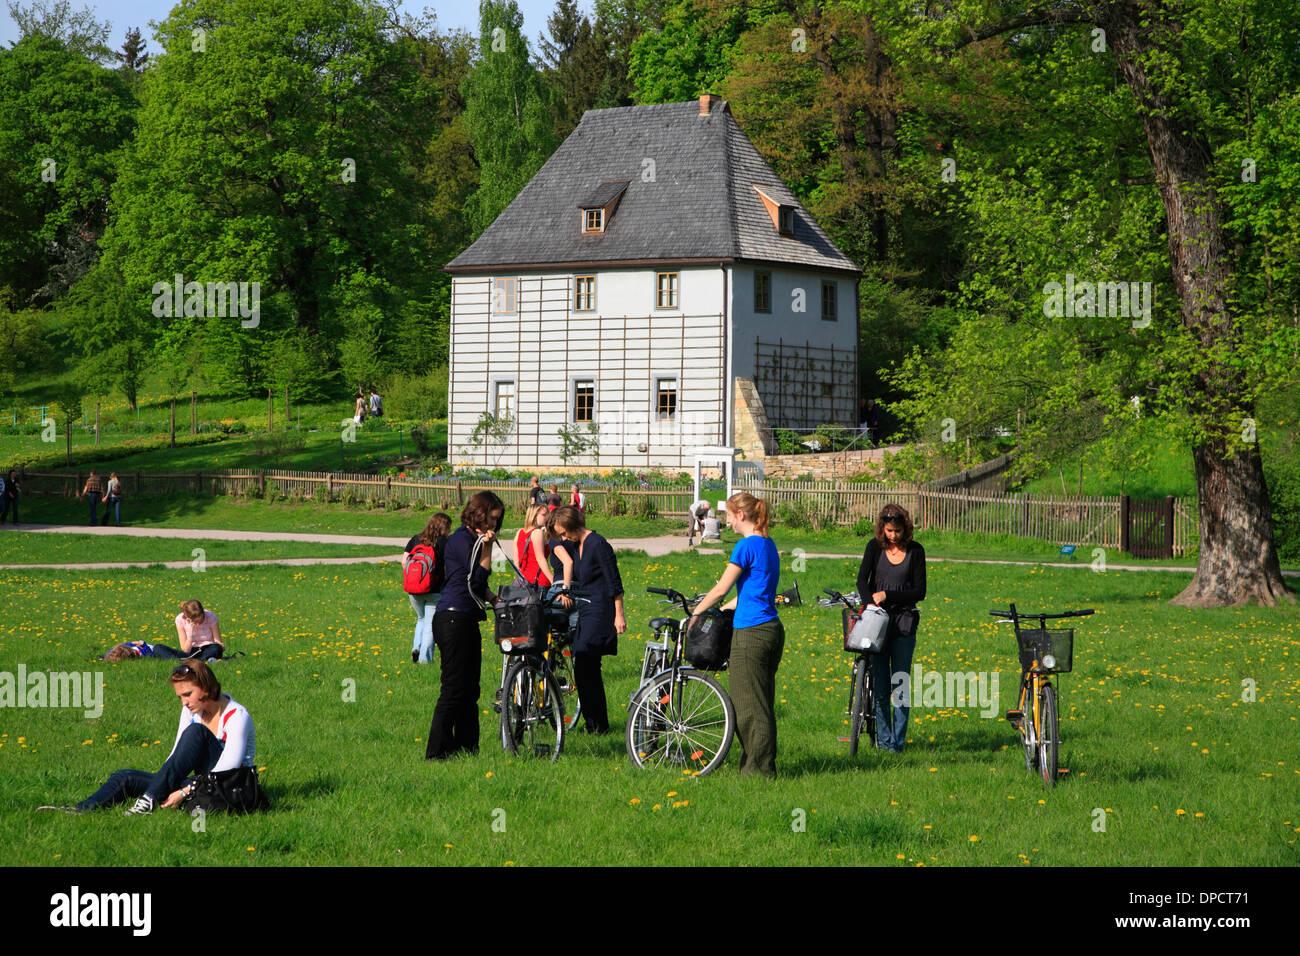 Goethe Garden House au parc Ilm, Weimar, Thuringe, Allemagne Banque D'Images